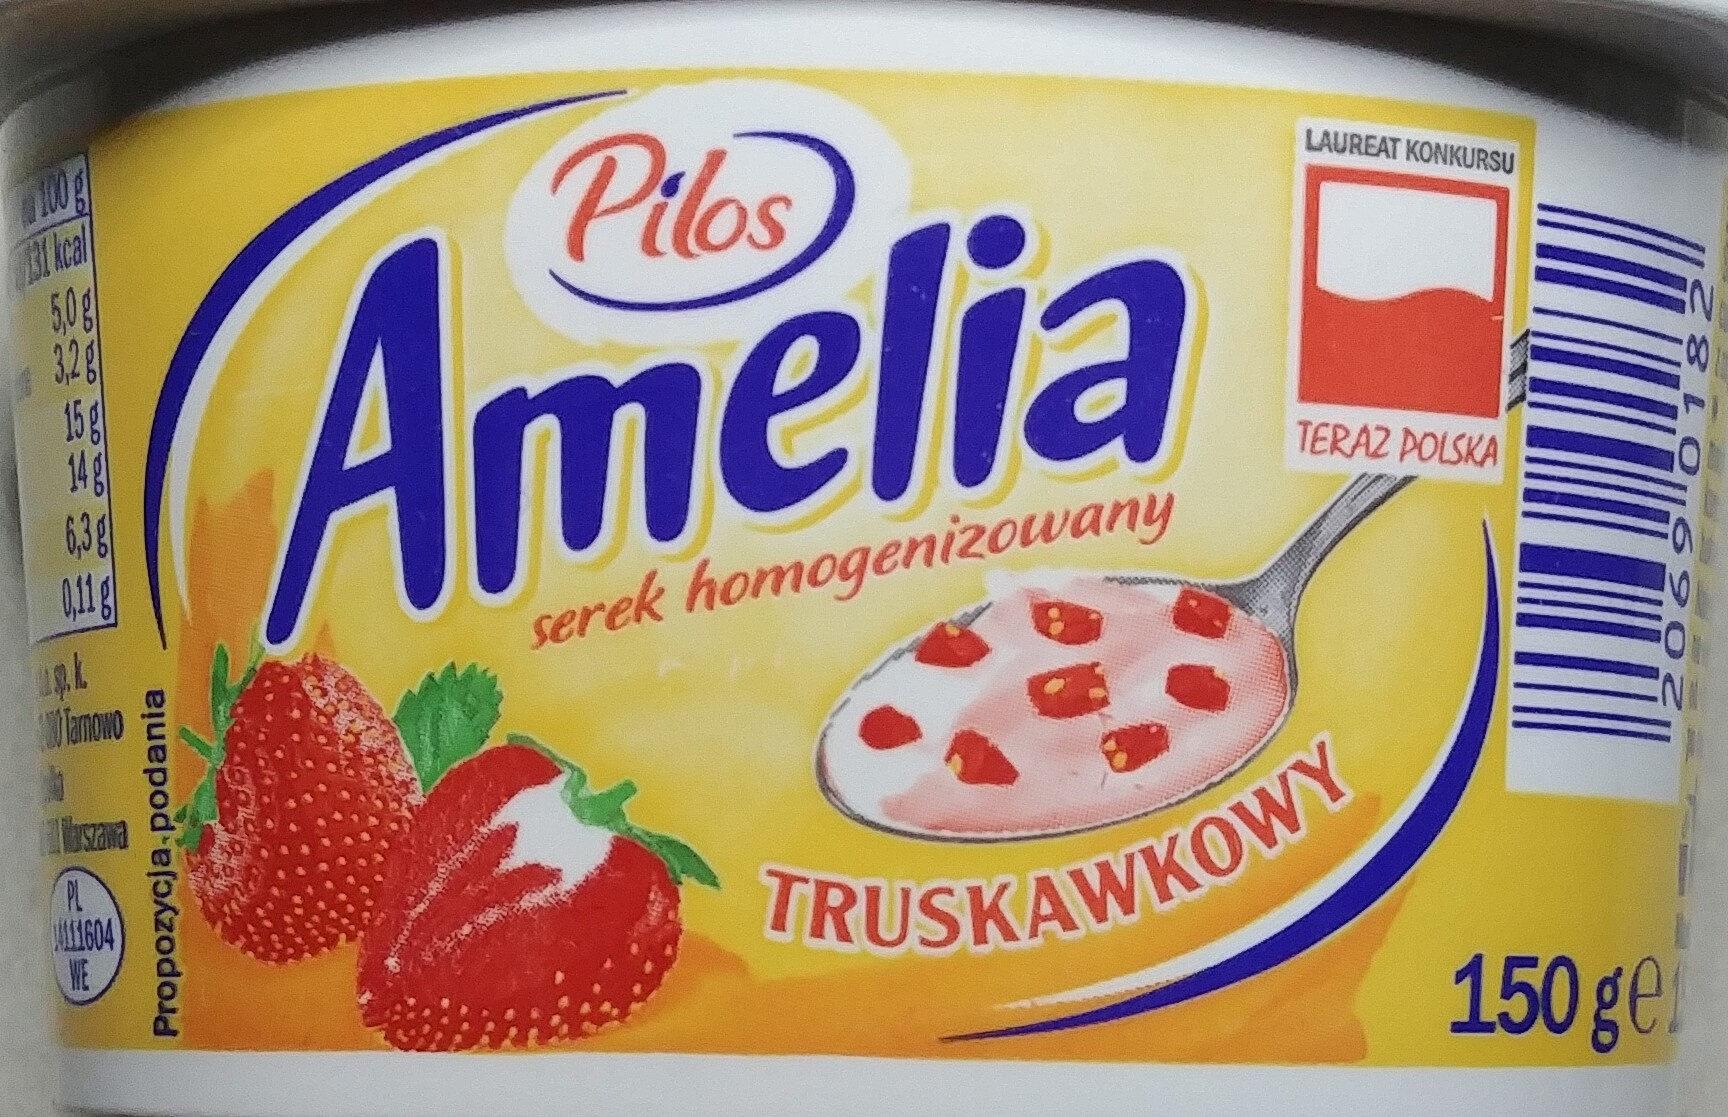 Serek homogenizowany truskawkowy - Produkt - pl